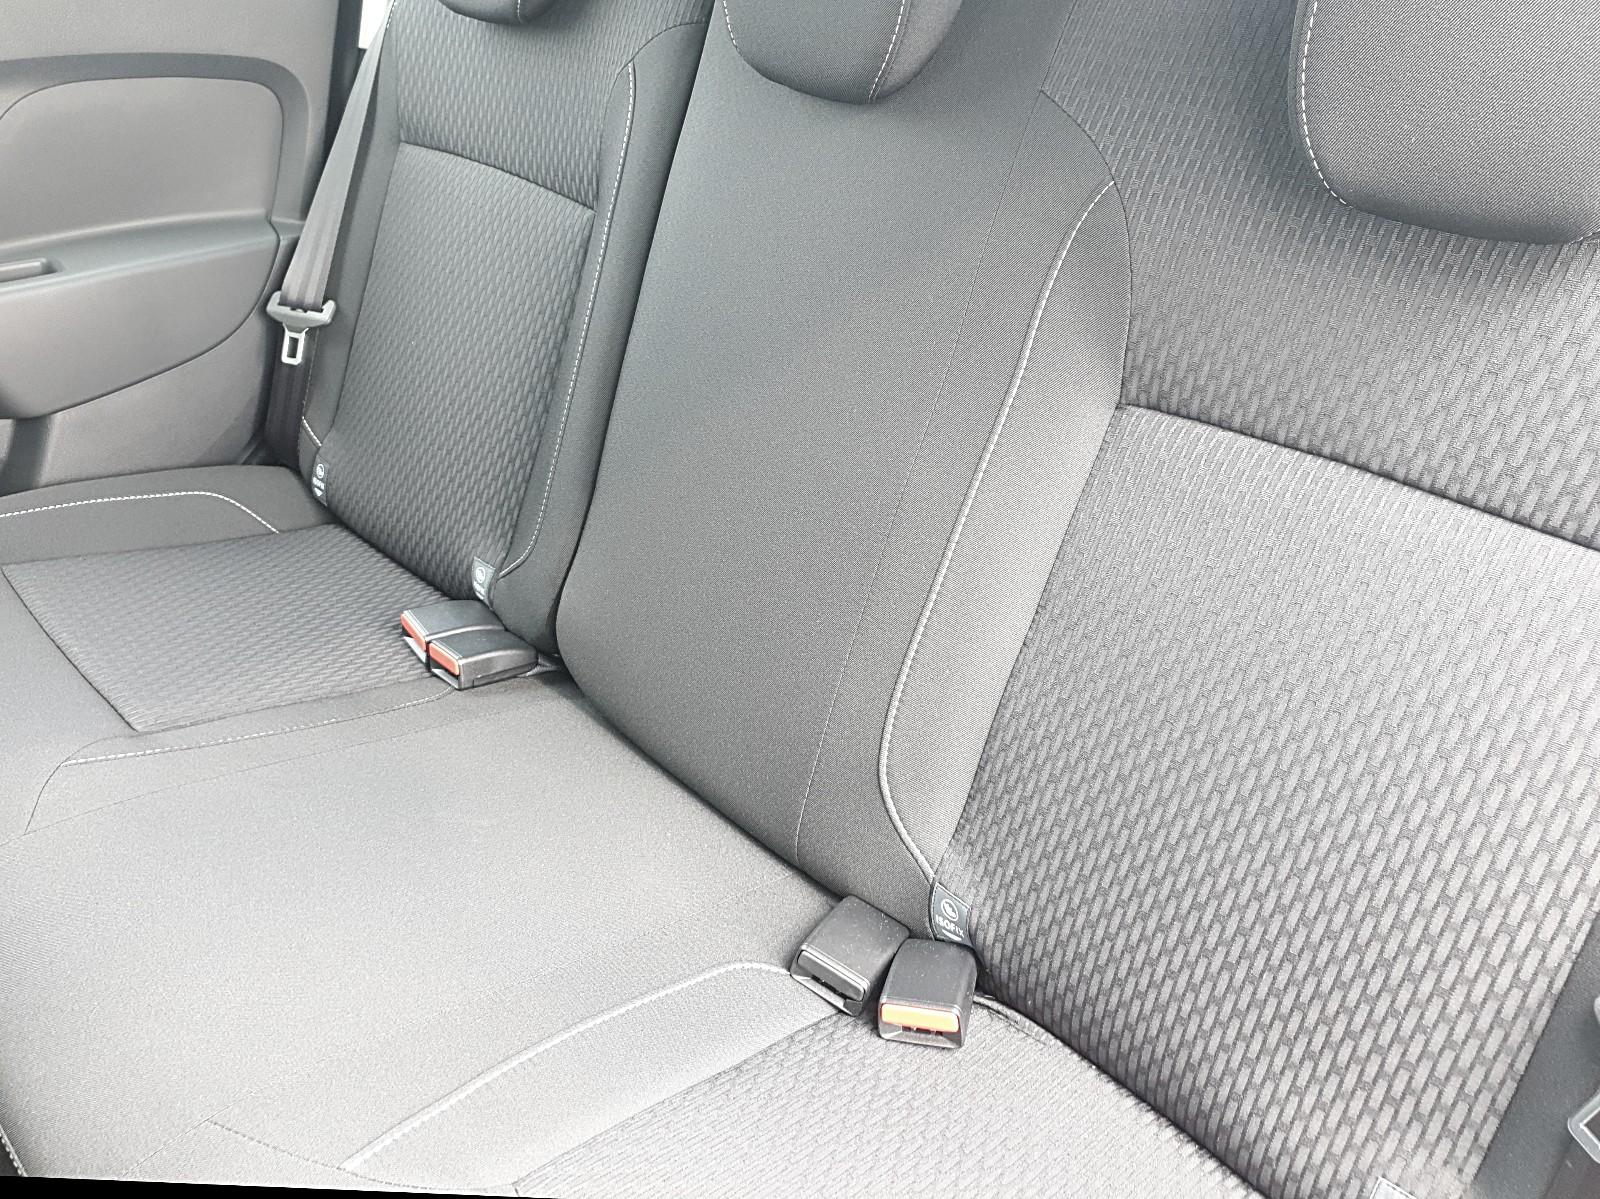 DACIA SANDERO 0.9 TCE 90PS Comfort 5-Türig Klima Navi Rückf.Kamera Bluetooth D Viscaal Fahrzeuggrosshandel GmbH, D-49847 Itterbeck